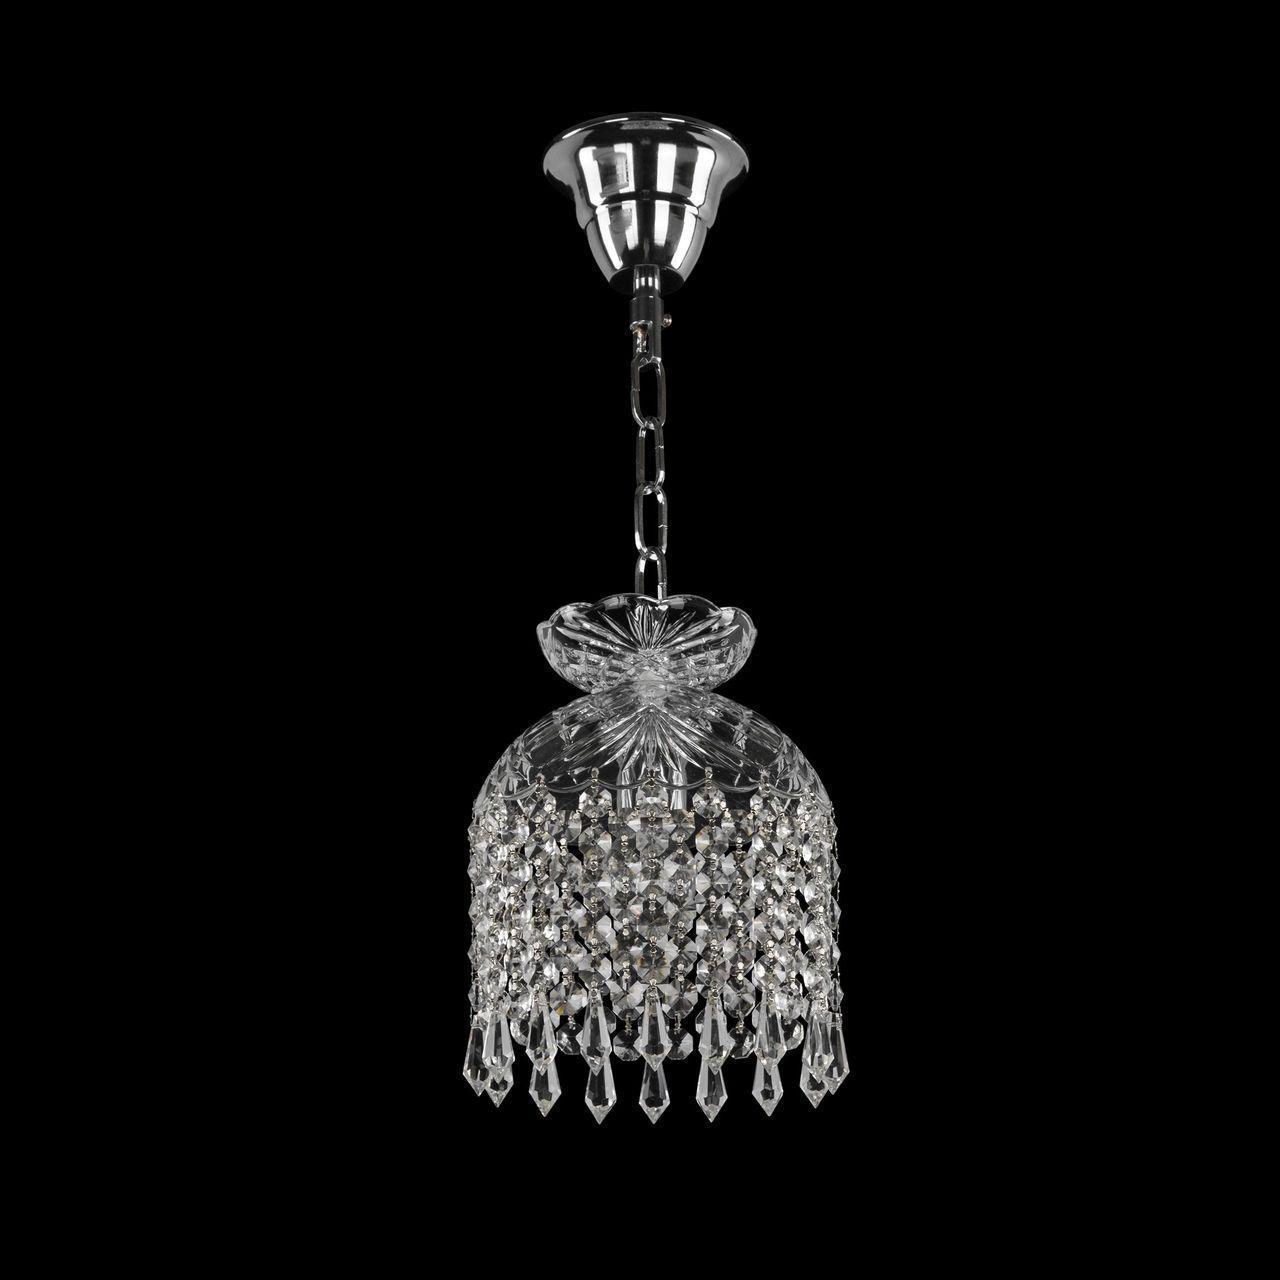 Подвесной светильник Bohemia Ivele 14783/16 Ni Drops